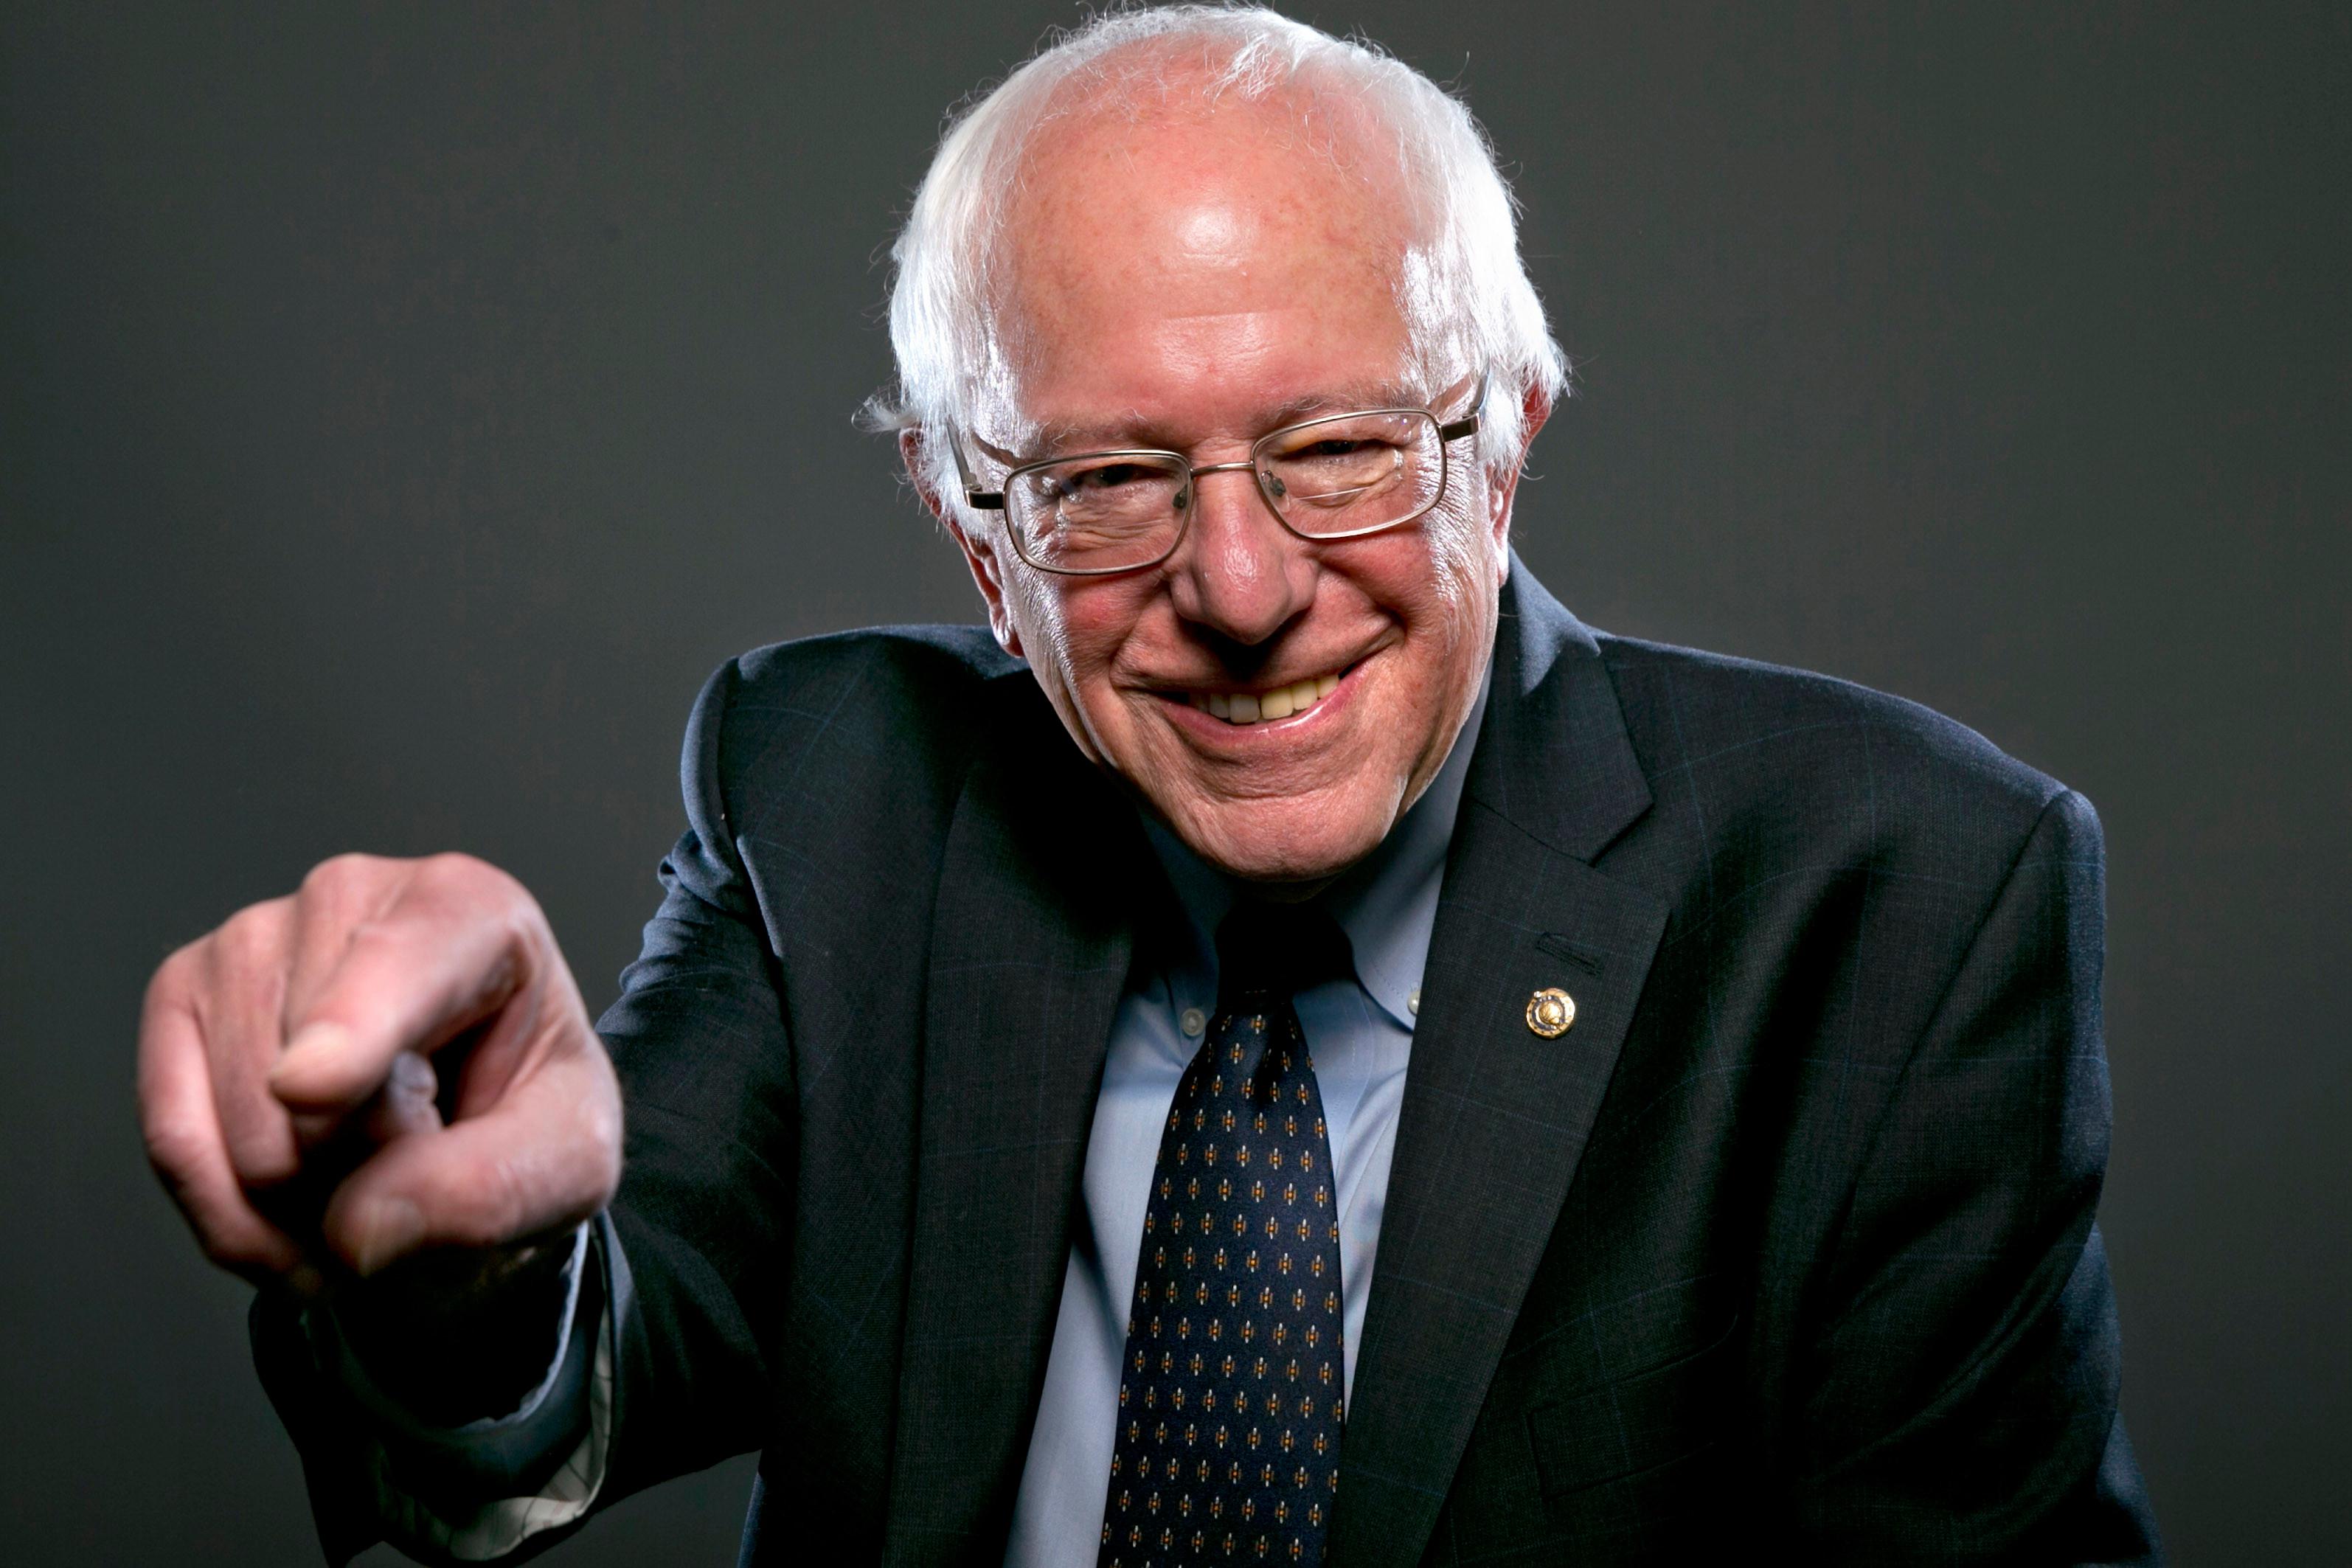 013 Bernie Sanders Rape Essay Dem 2016 Sandersquality90stripall Phenomenal Full